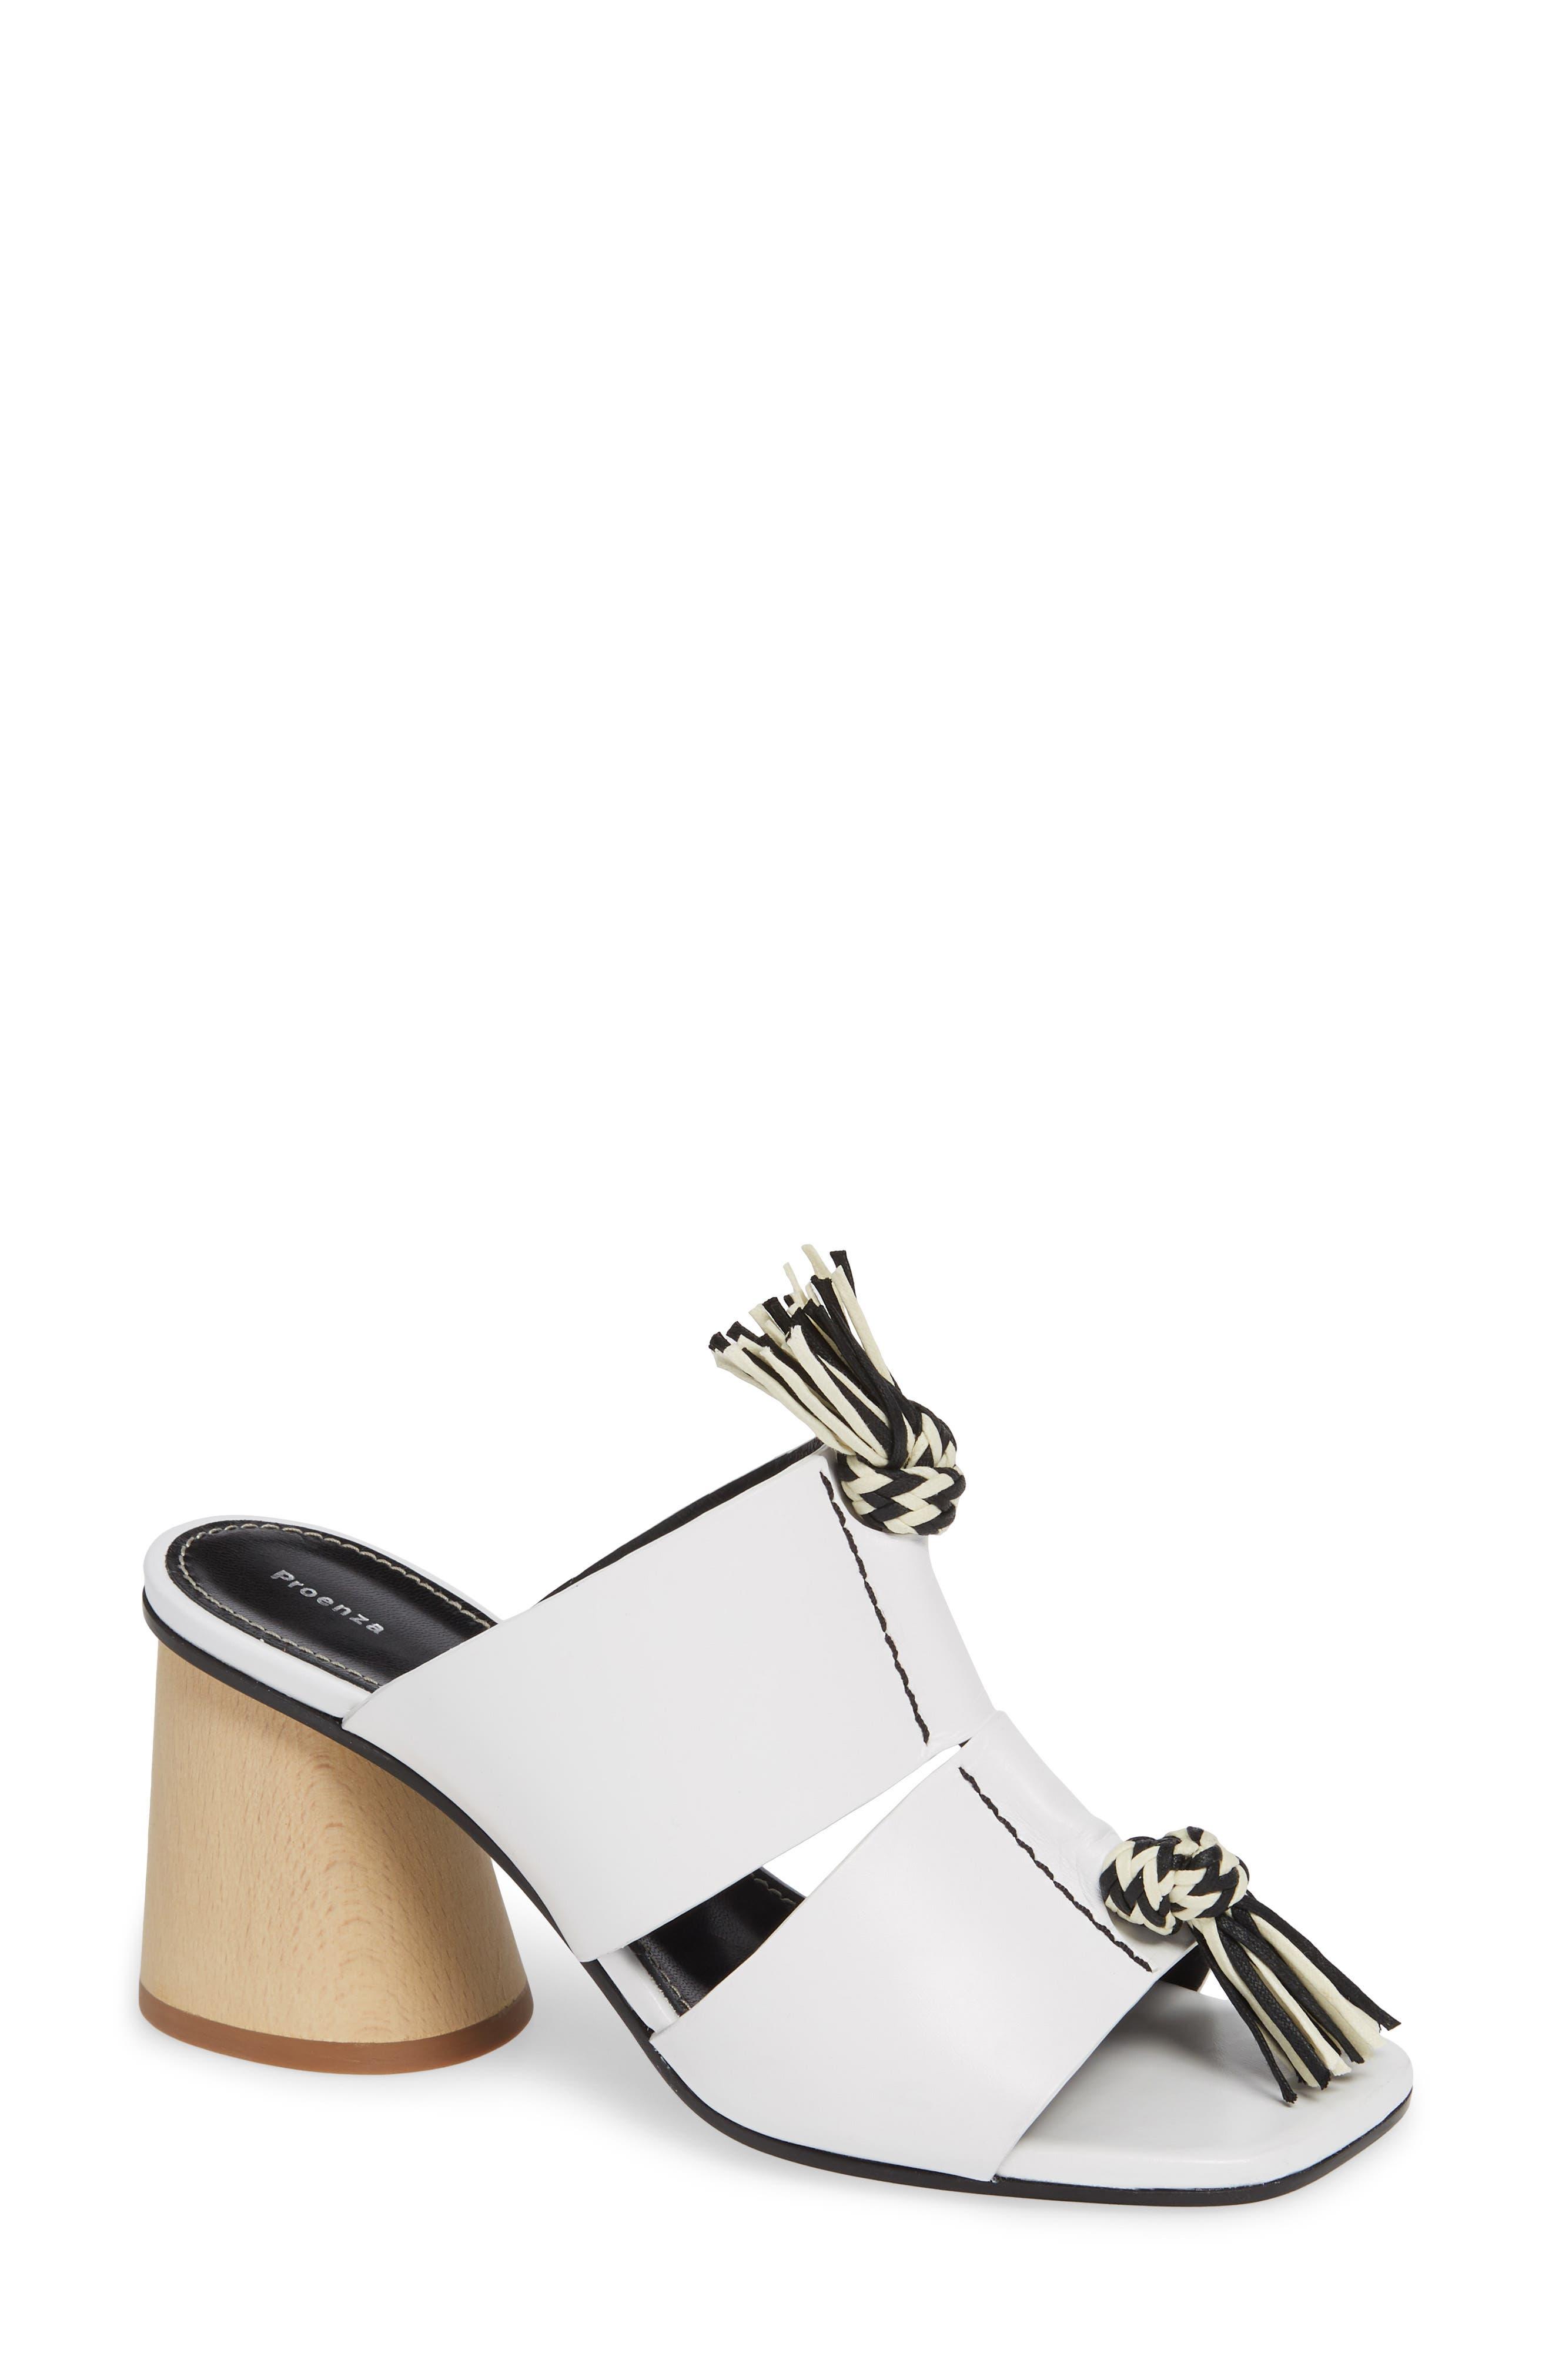 PROENZA SCHOULER, Cylinder Heel Slide Sandal, Main thumbnail 1, color, WHITE